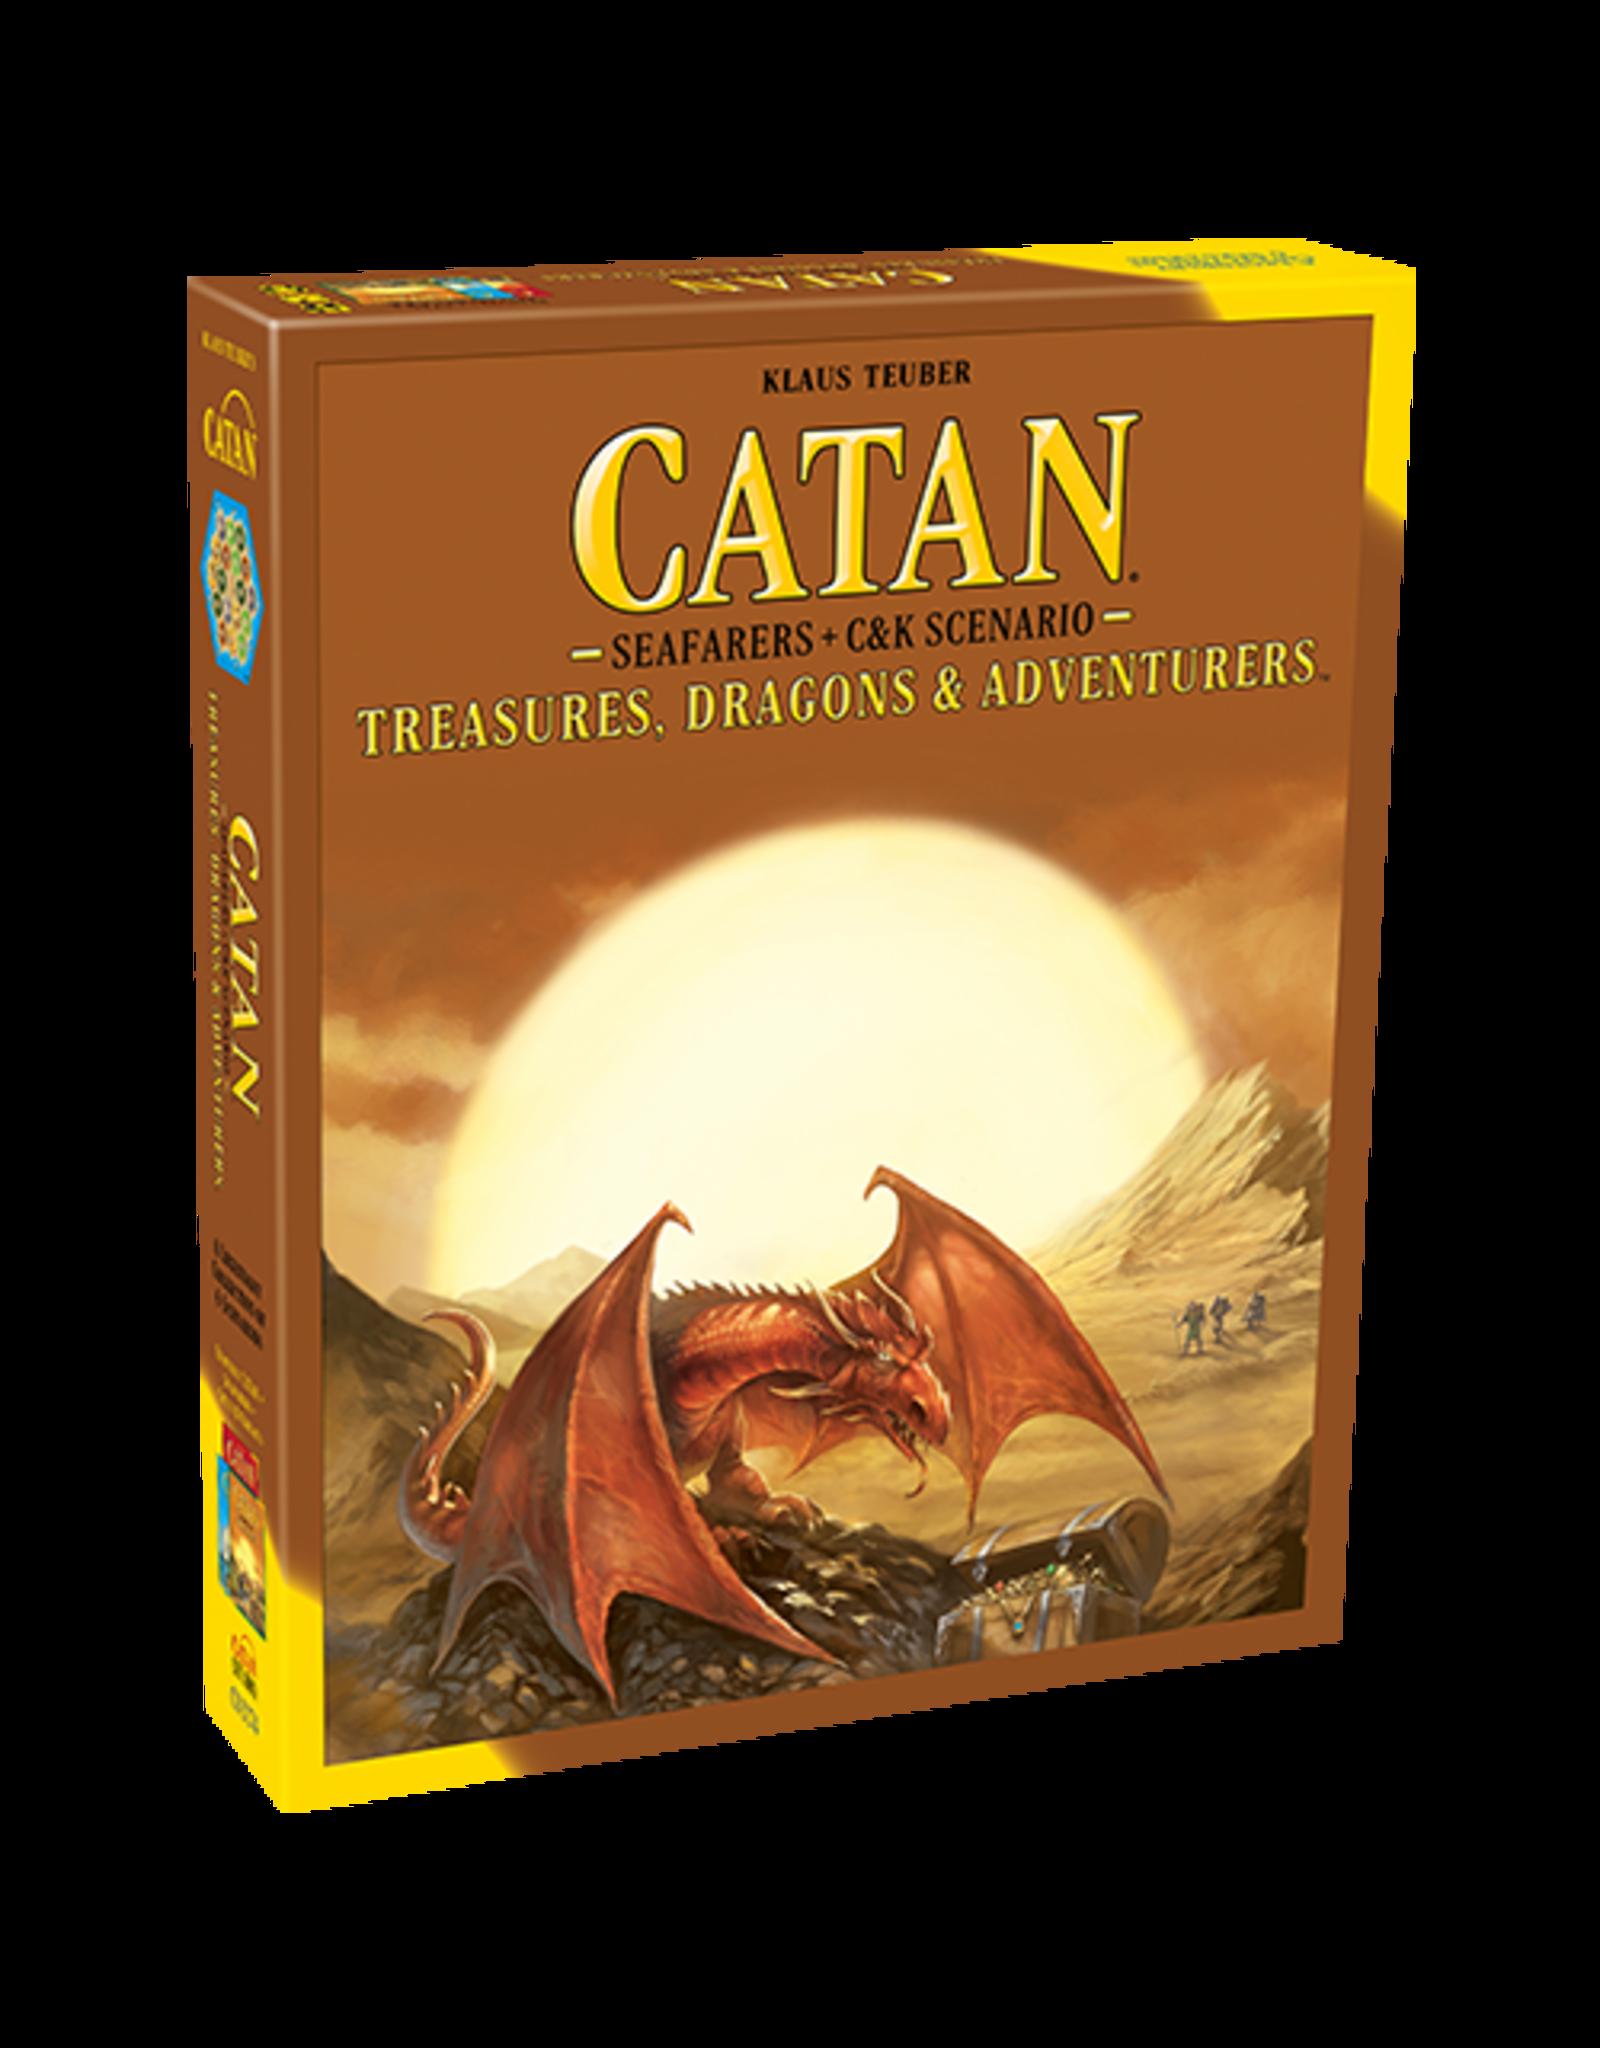 Catan Studio Catan Treasures, Dragons, & Adventurers